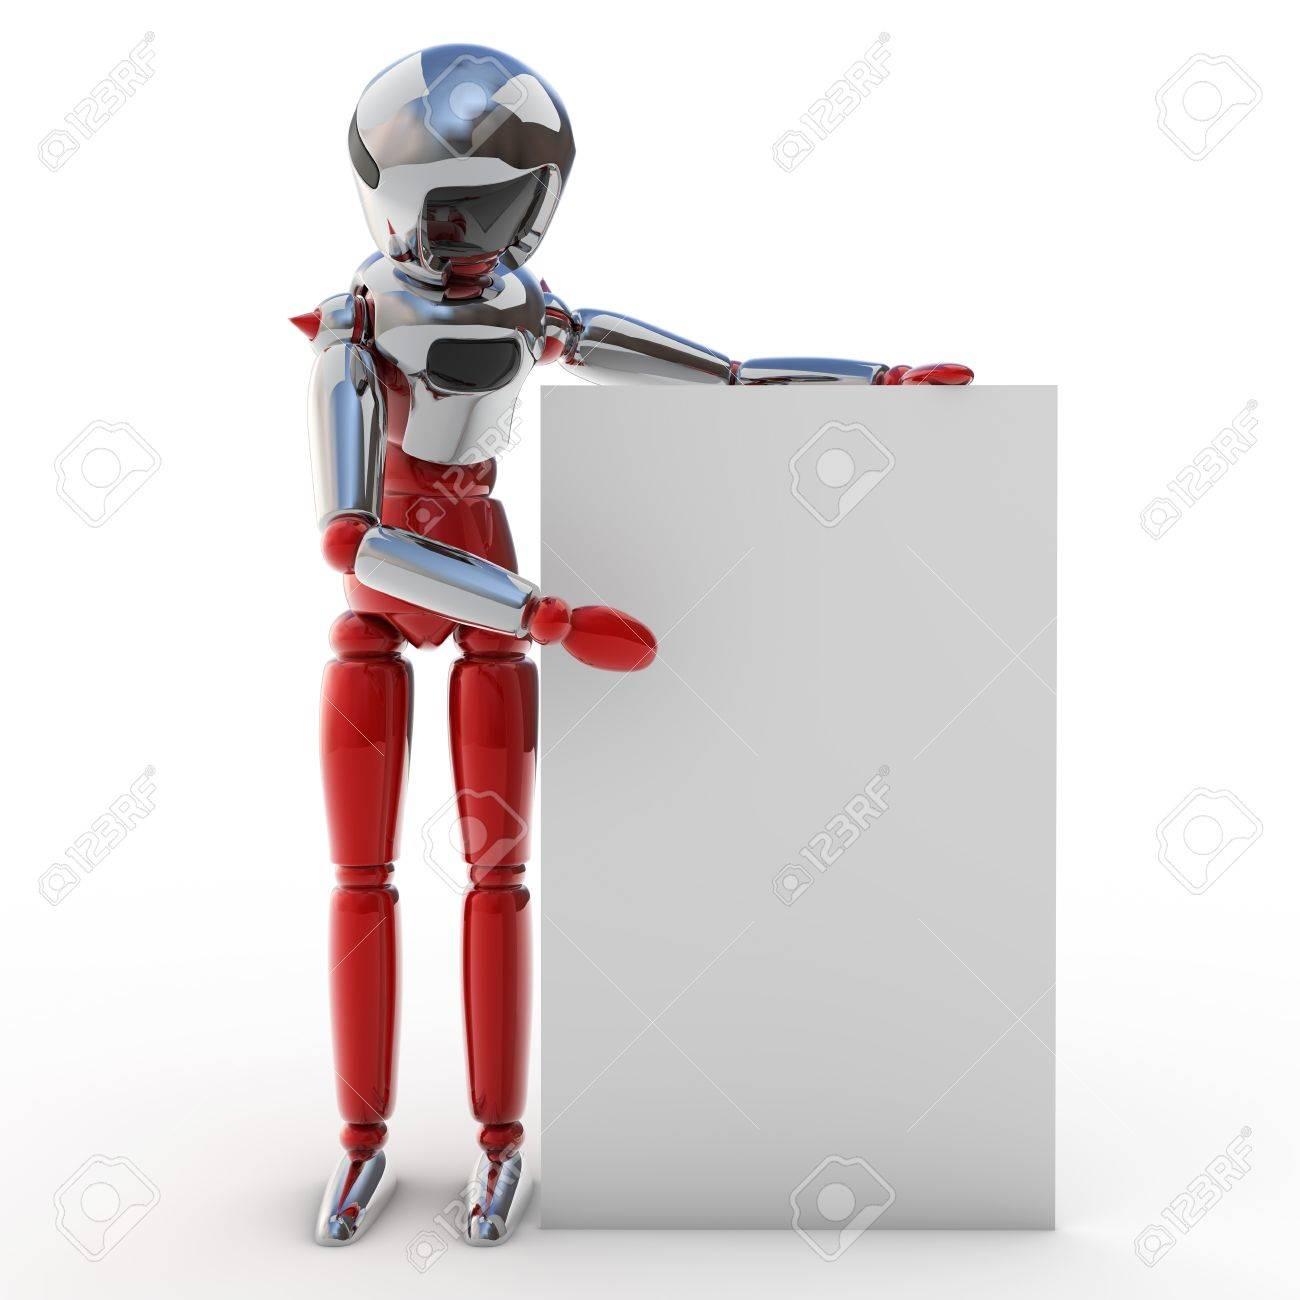 Robot poster Stock Photo - 12470015